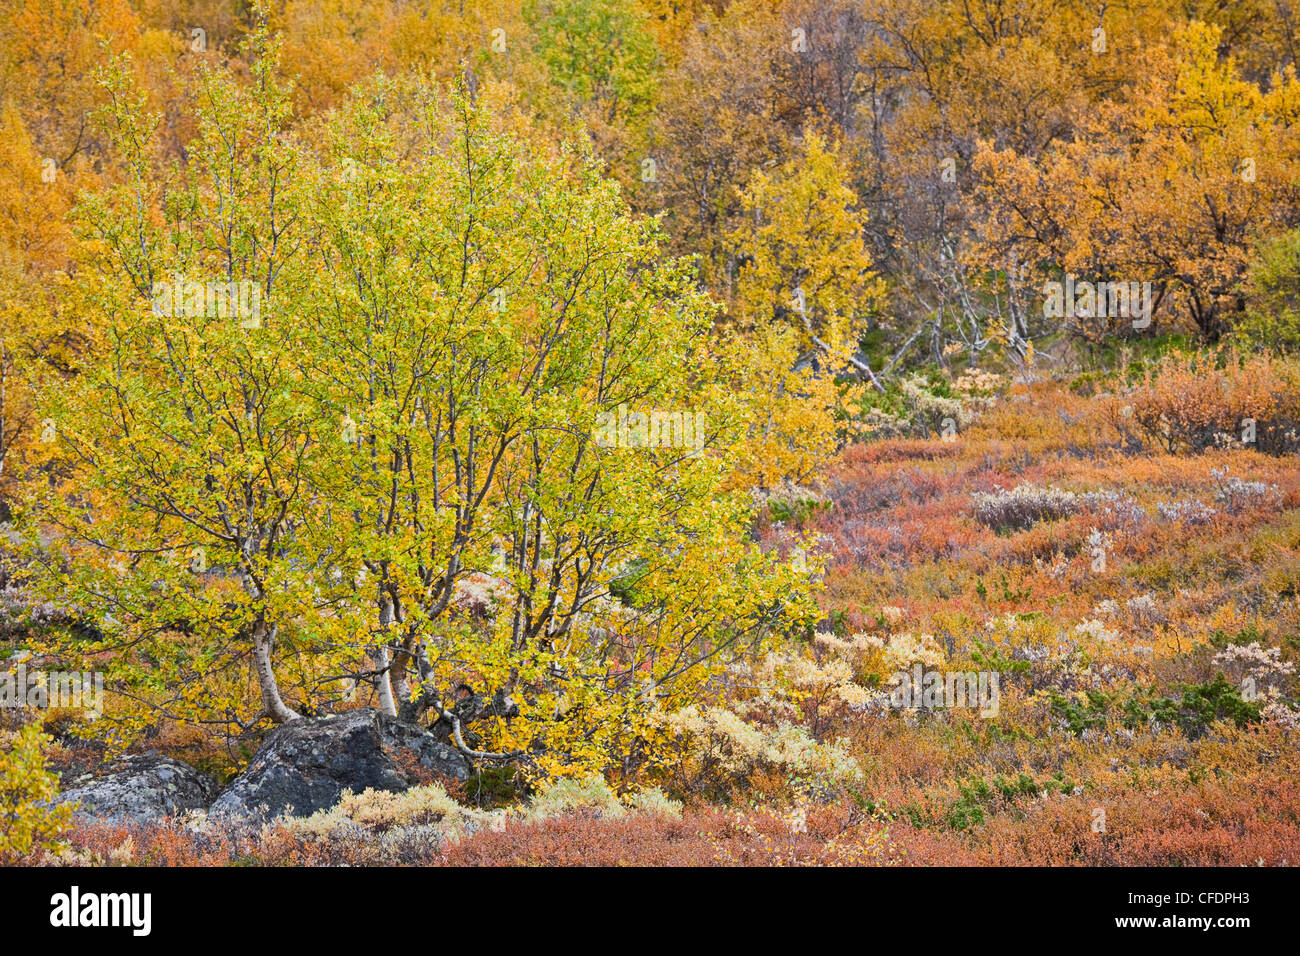 Autumnal trees at Jotunheimen National Park, Leirdalen, Norway, Europe - Stock Image